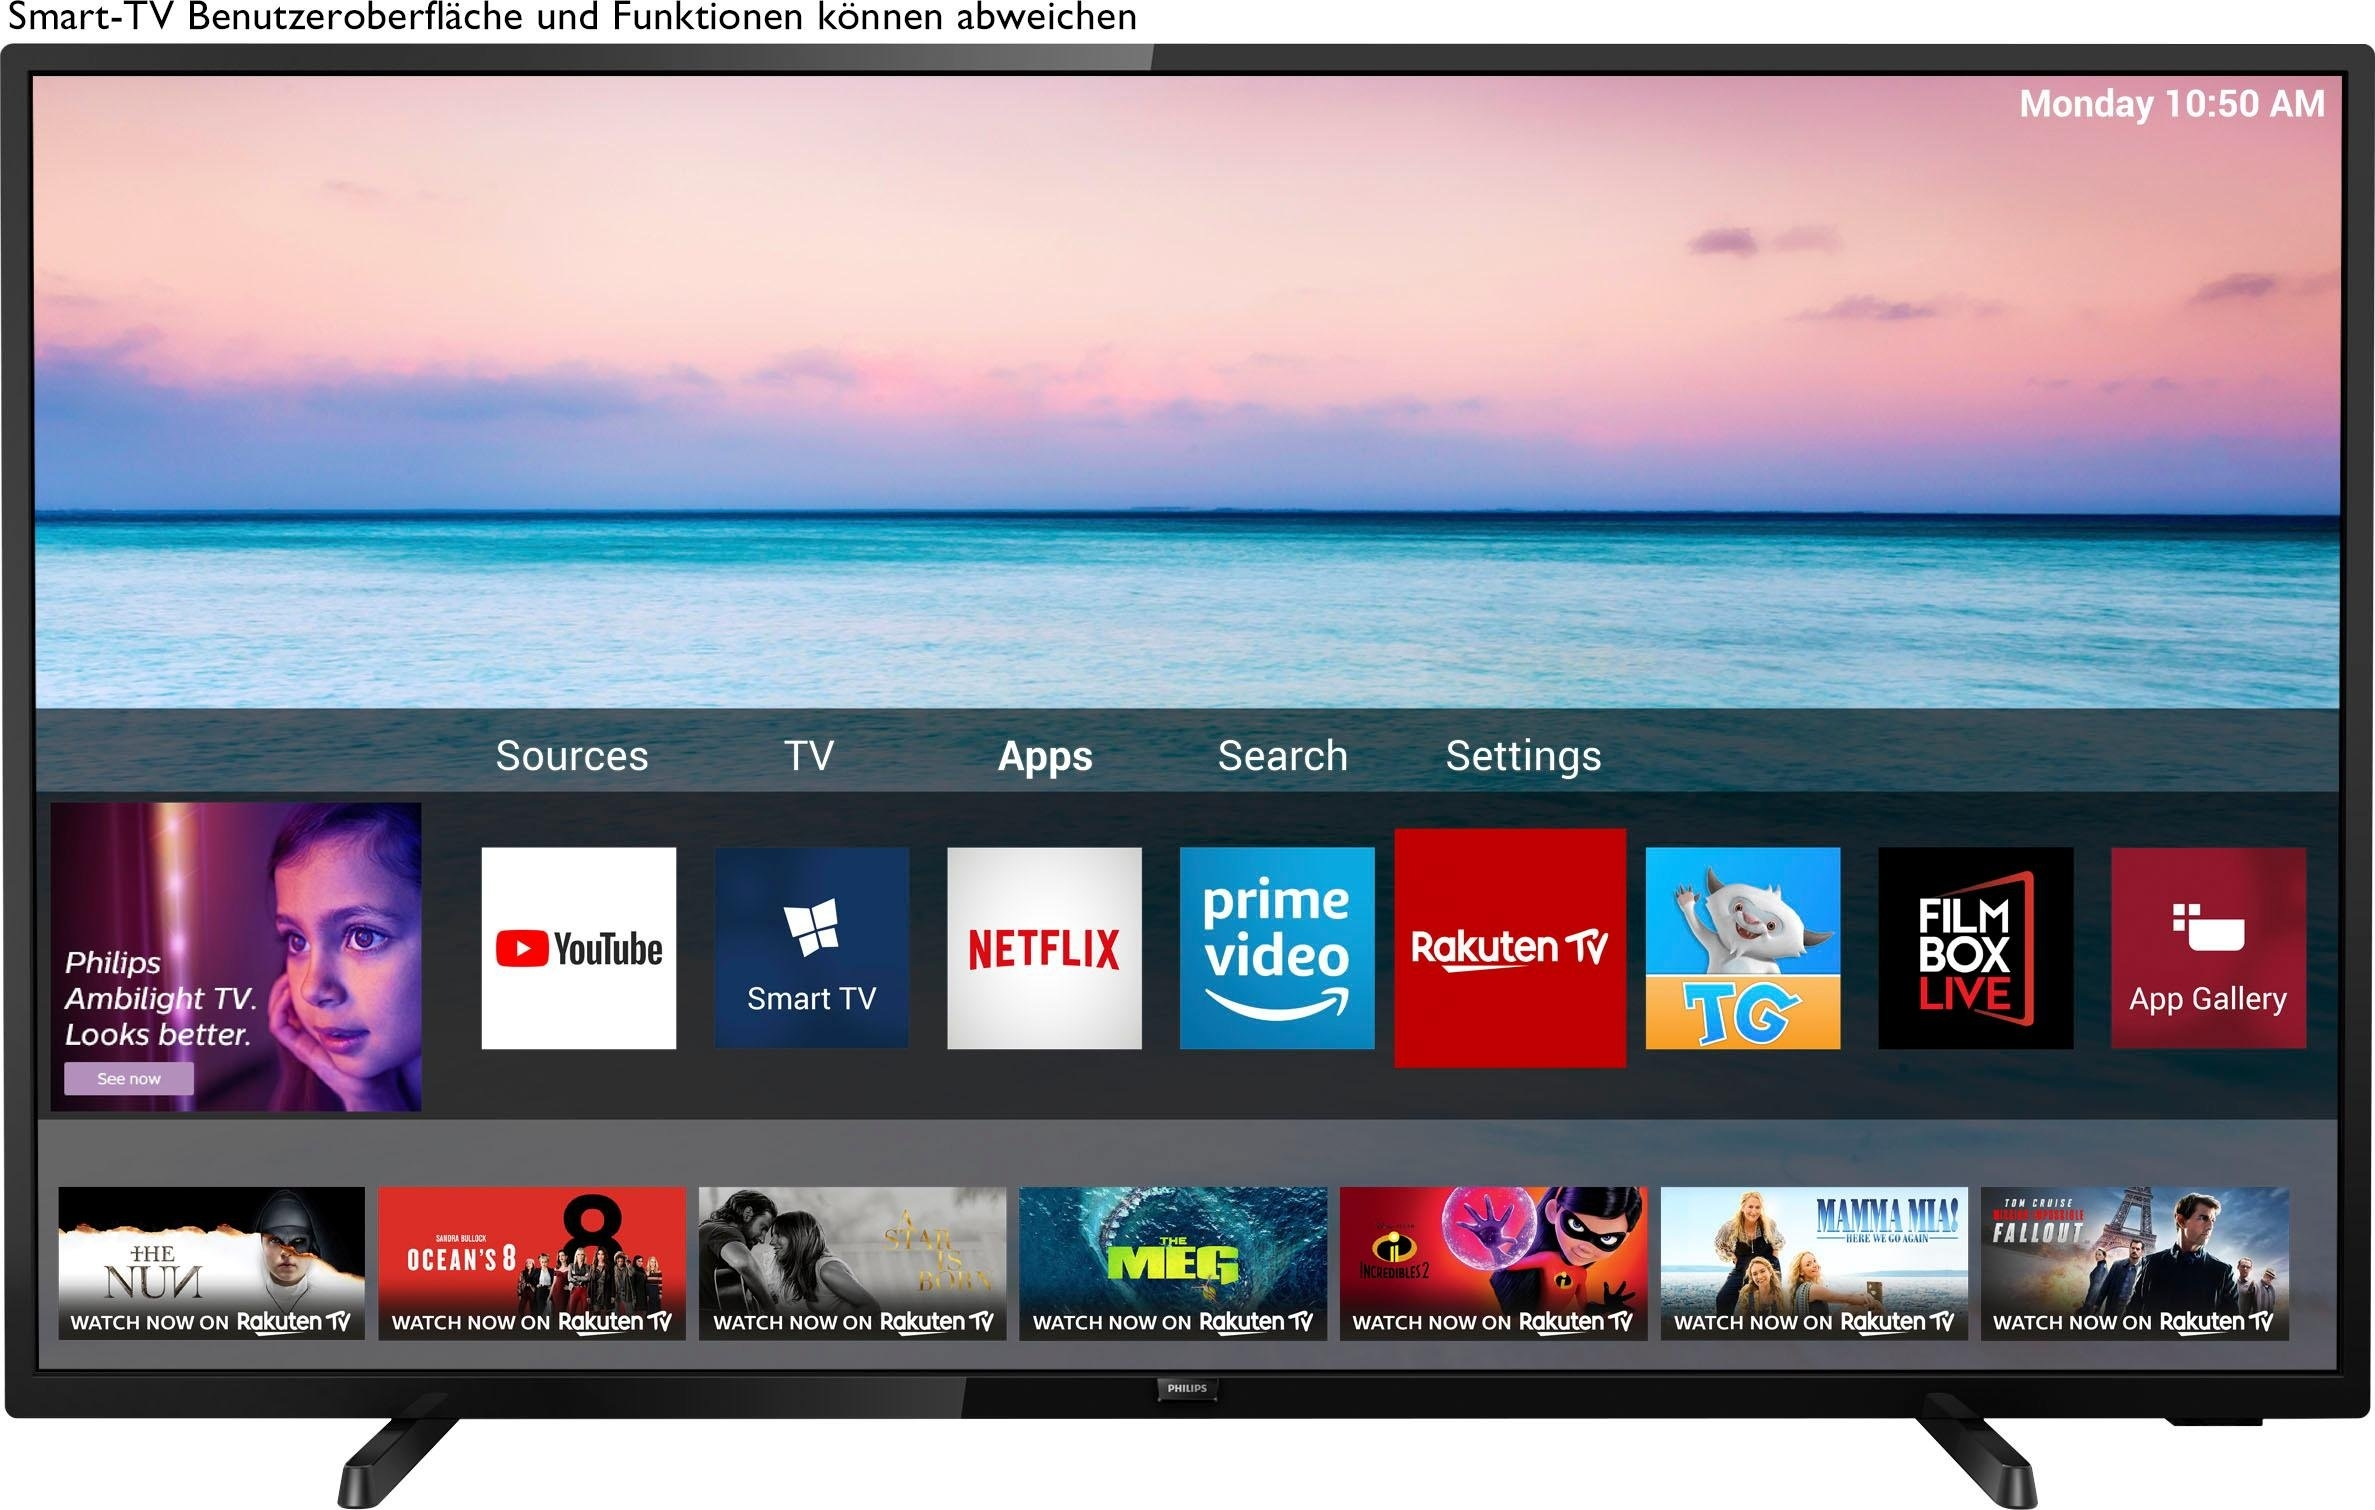 Philips 70PUS6504/12 led-tv (178 cm / 70 inch), 4K Ultra HD, smart-tv online kopen op otto.nl